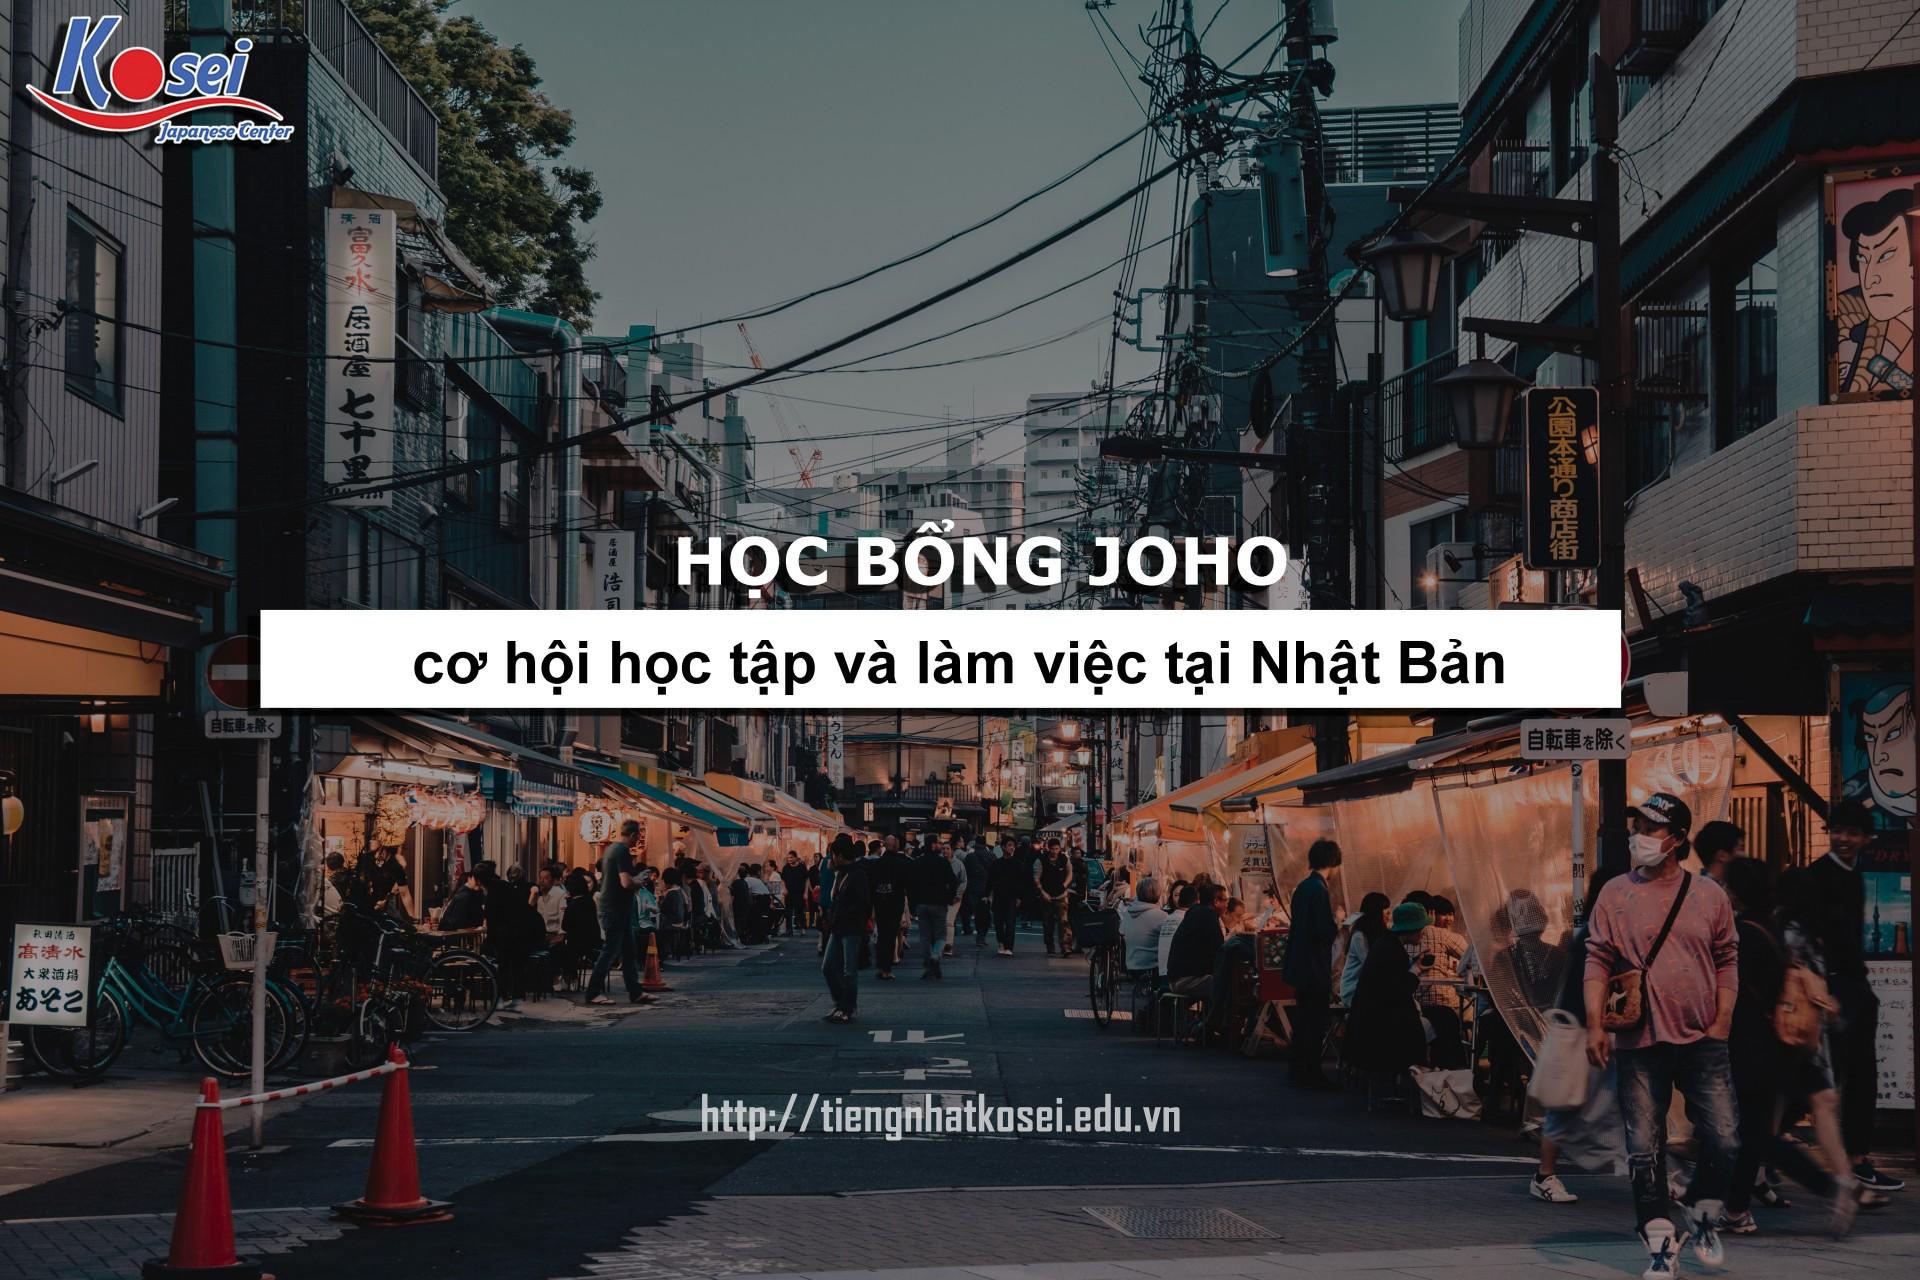 http://kosei.vn/tuyen-sinh-hoc-bong-du-hoc-joho-ky-thang-4-2019-n1731.html